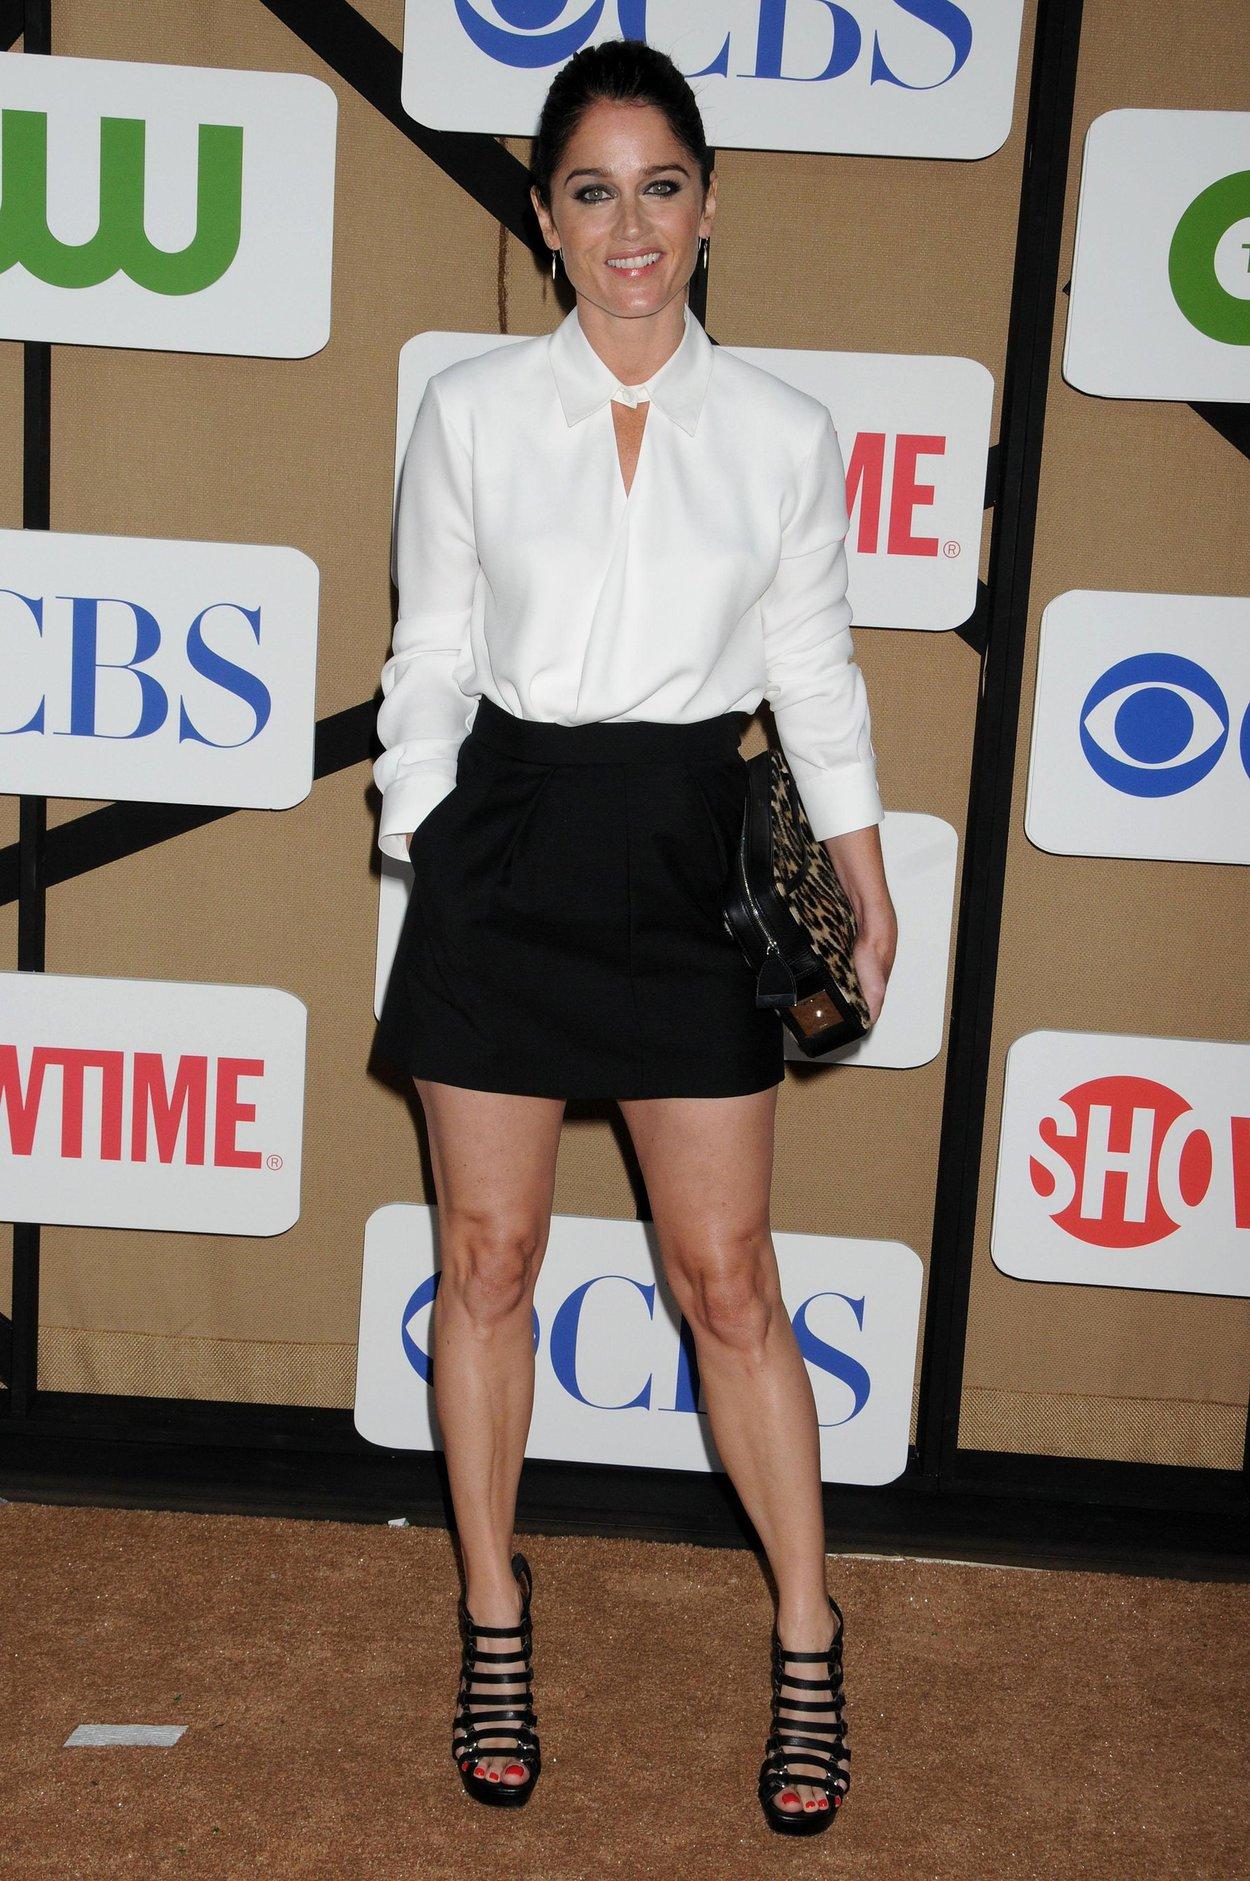 Robin Tunney CBS Summer TCA Party Los Angeles California July 29, 2013